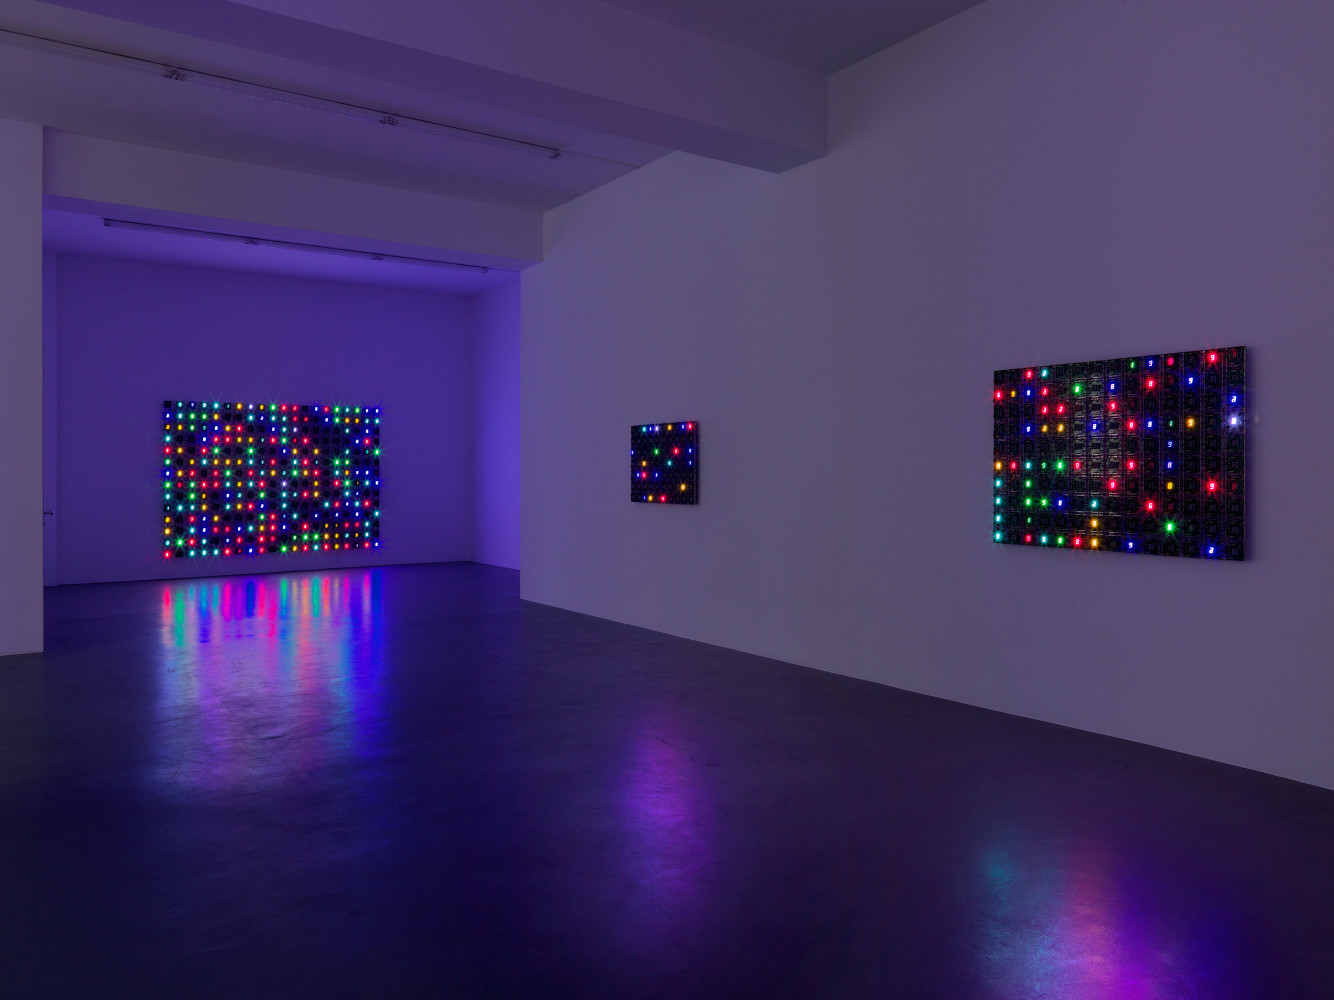 Tatsuo Miyajima, 'Life (Rhizome)', Installation view, Buchmann Galerie, 2013